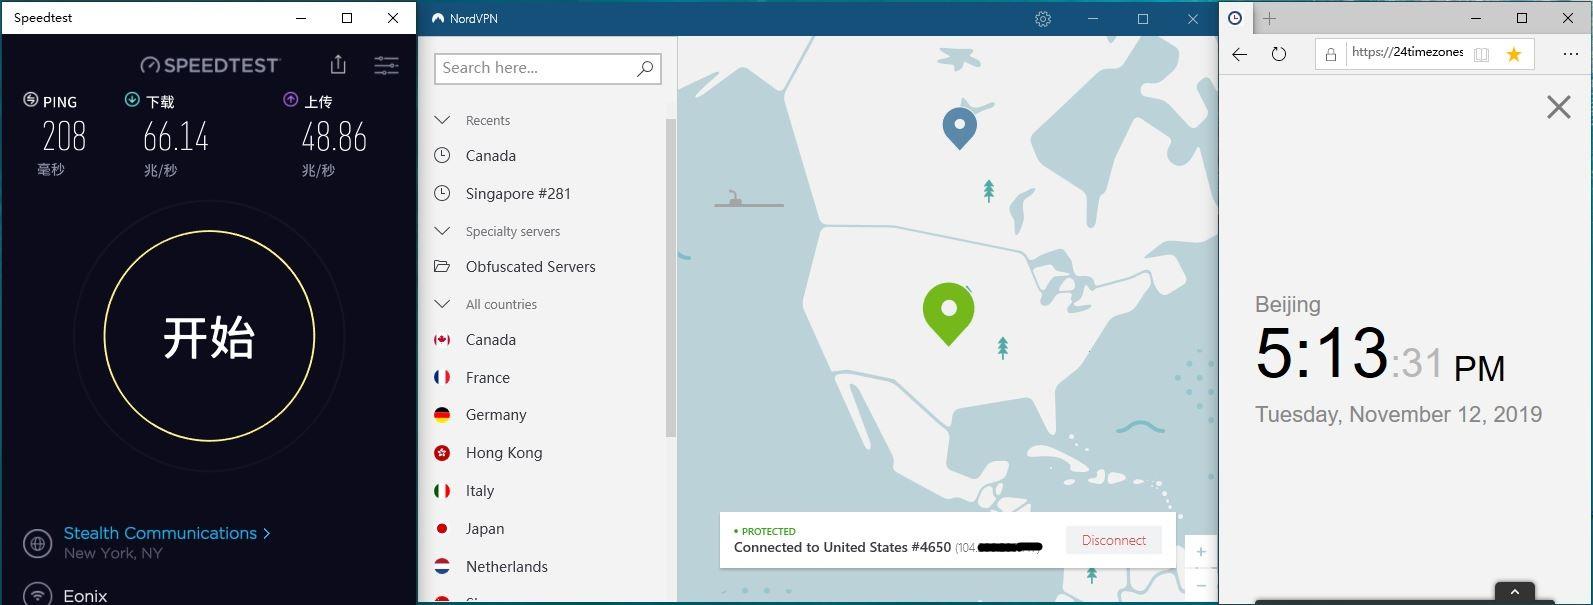 Windows NordVPN Untied States4650 中国VPN翻墙 科学上网 Speedtest测速-20191112